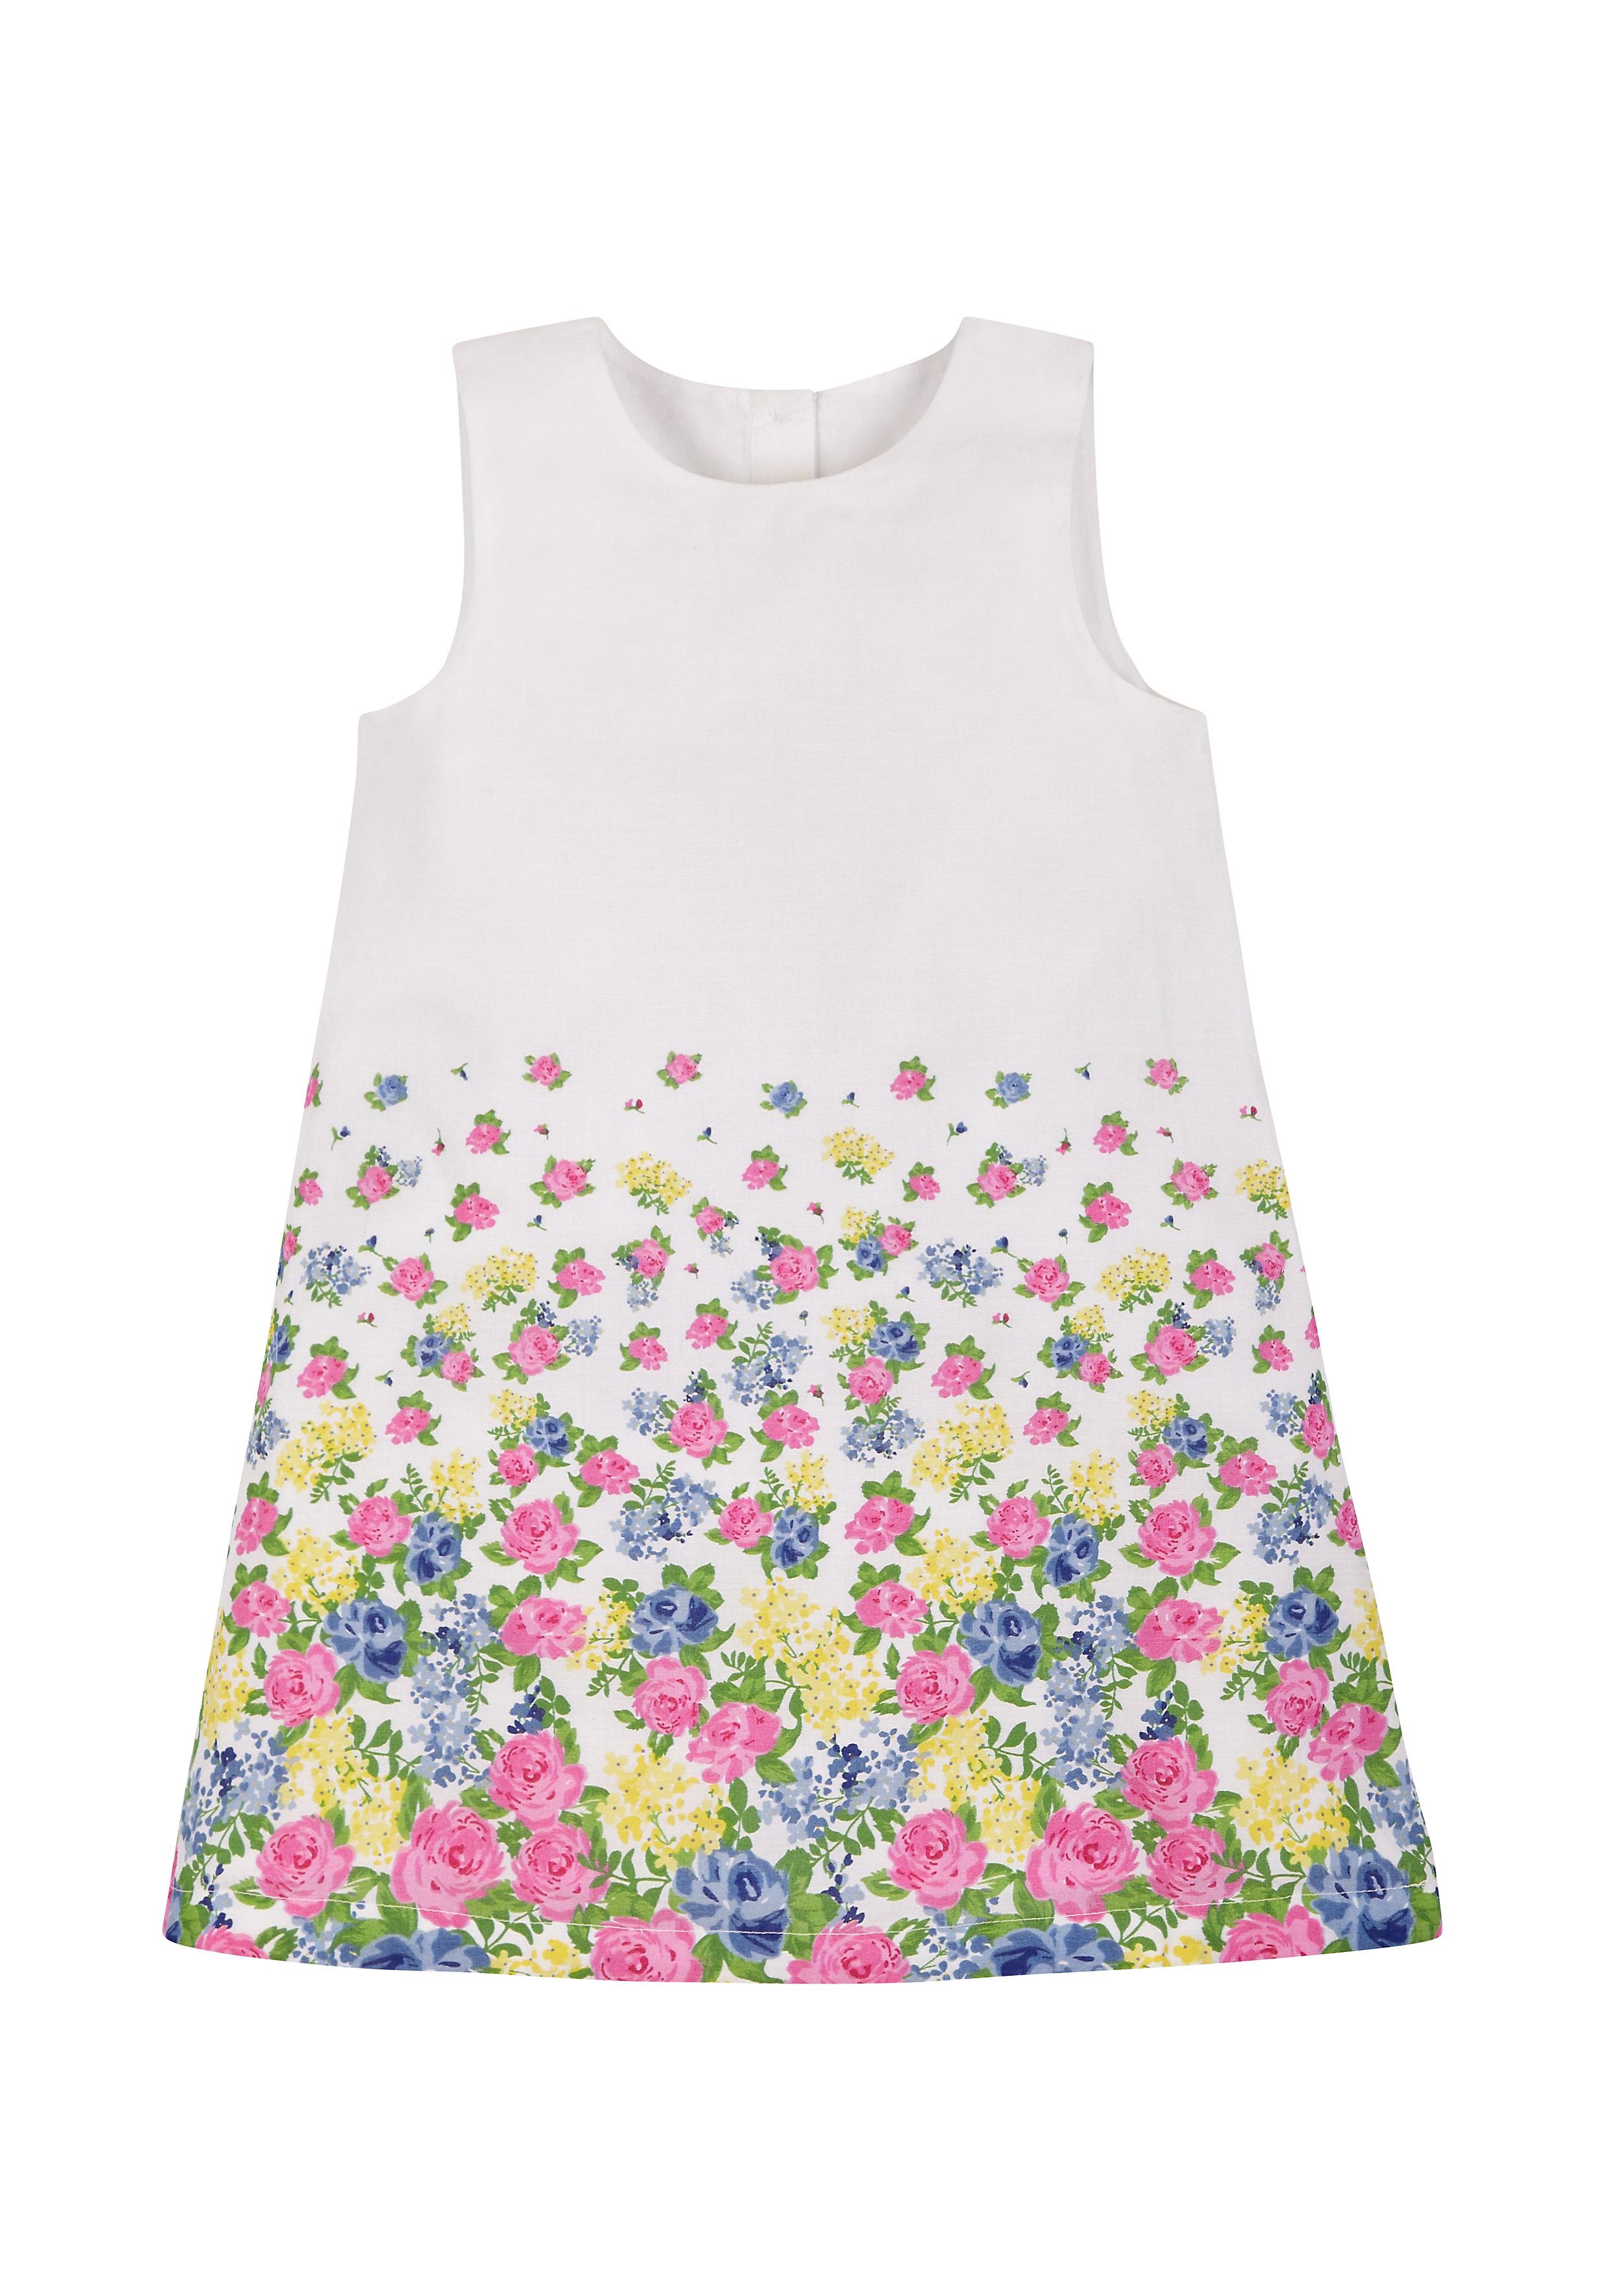 Mothercare | Girls Floral Print Dress